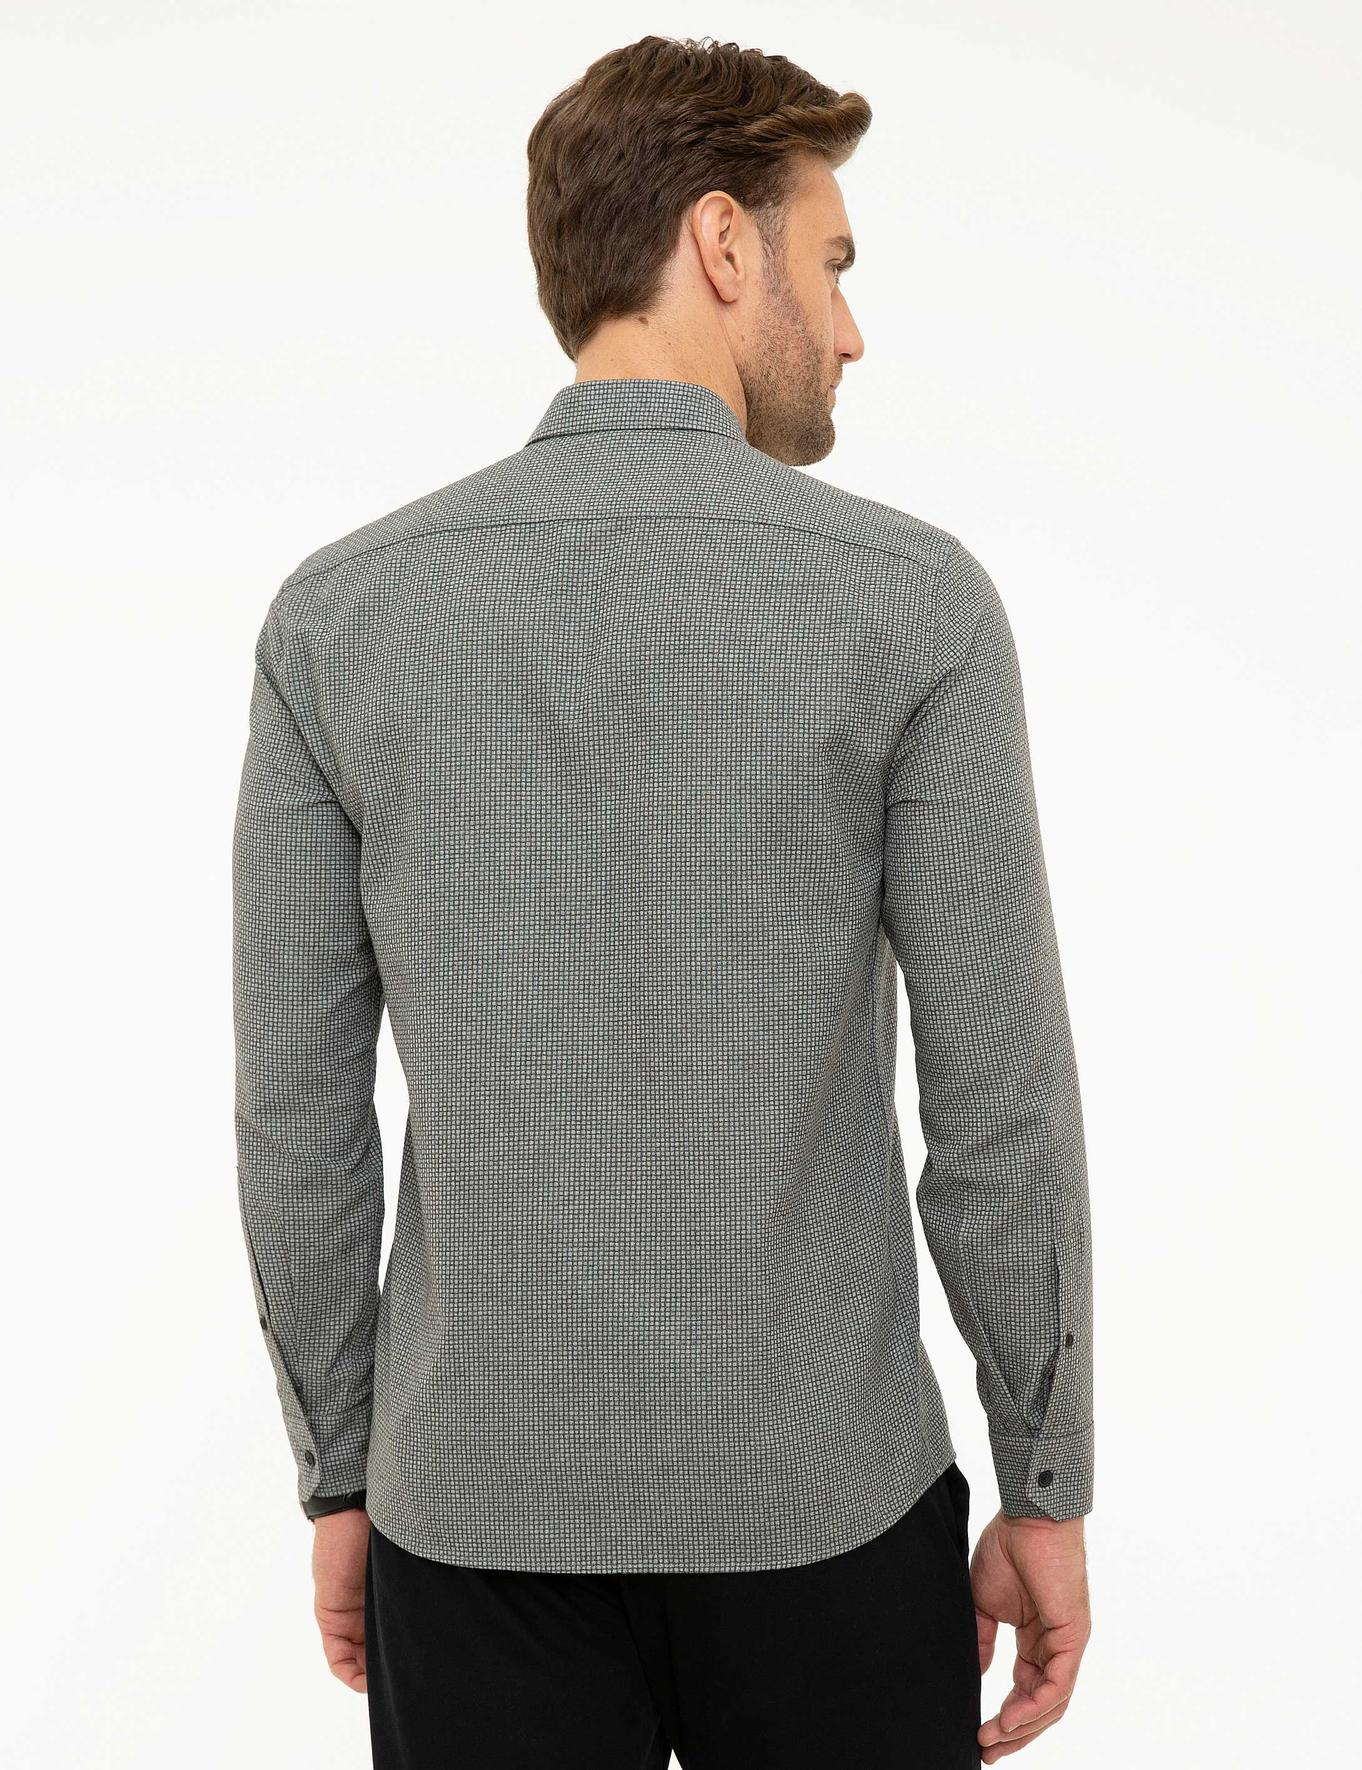 Antrasit Slim Fit Gömlek